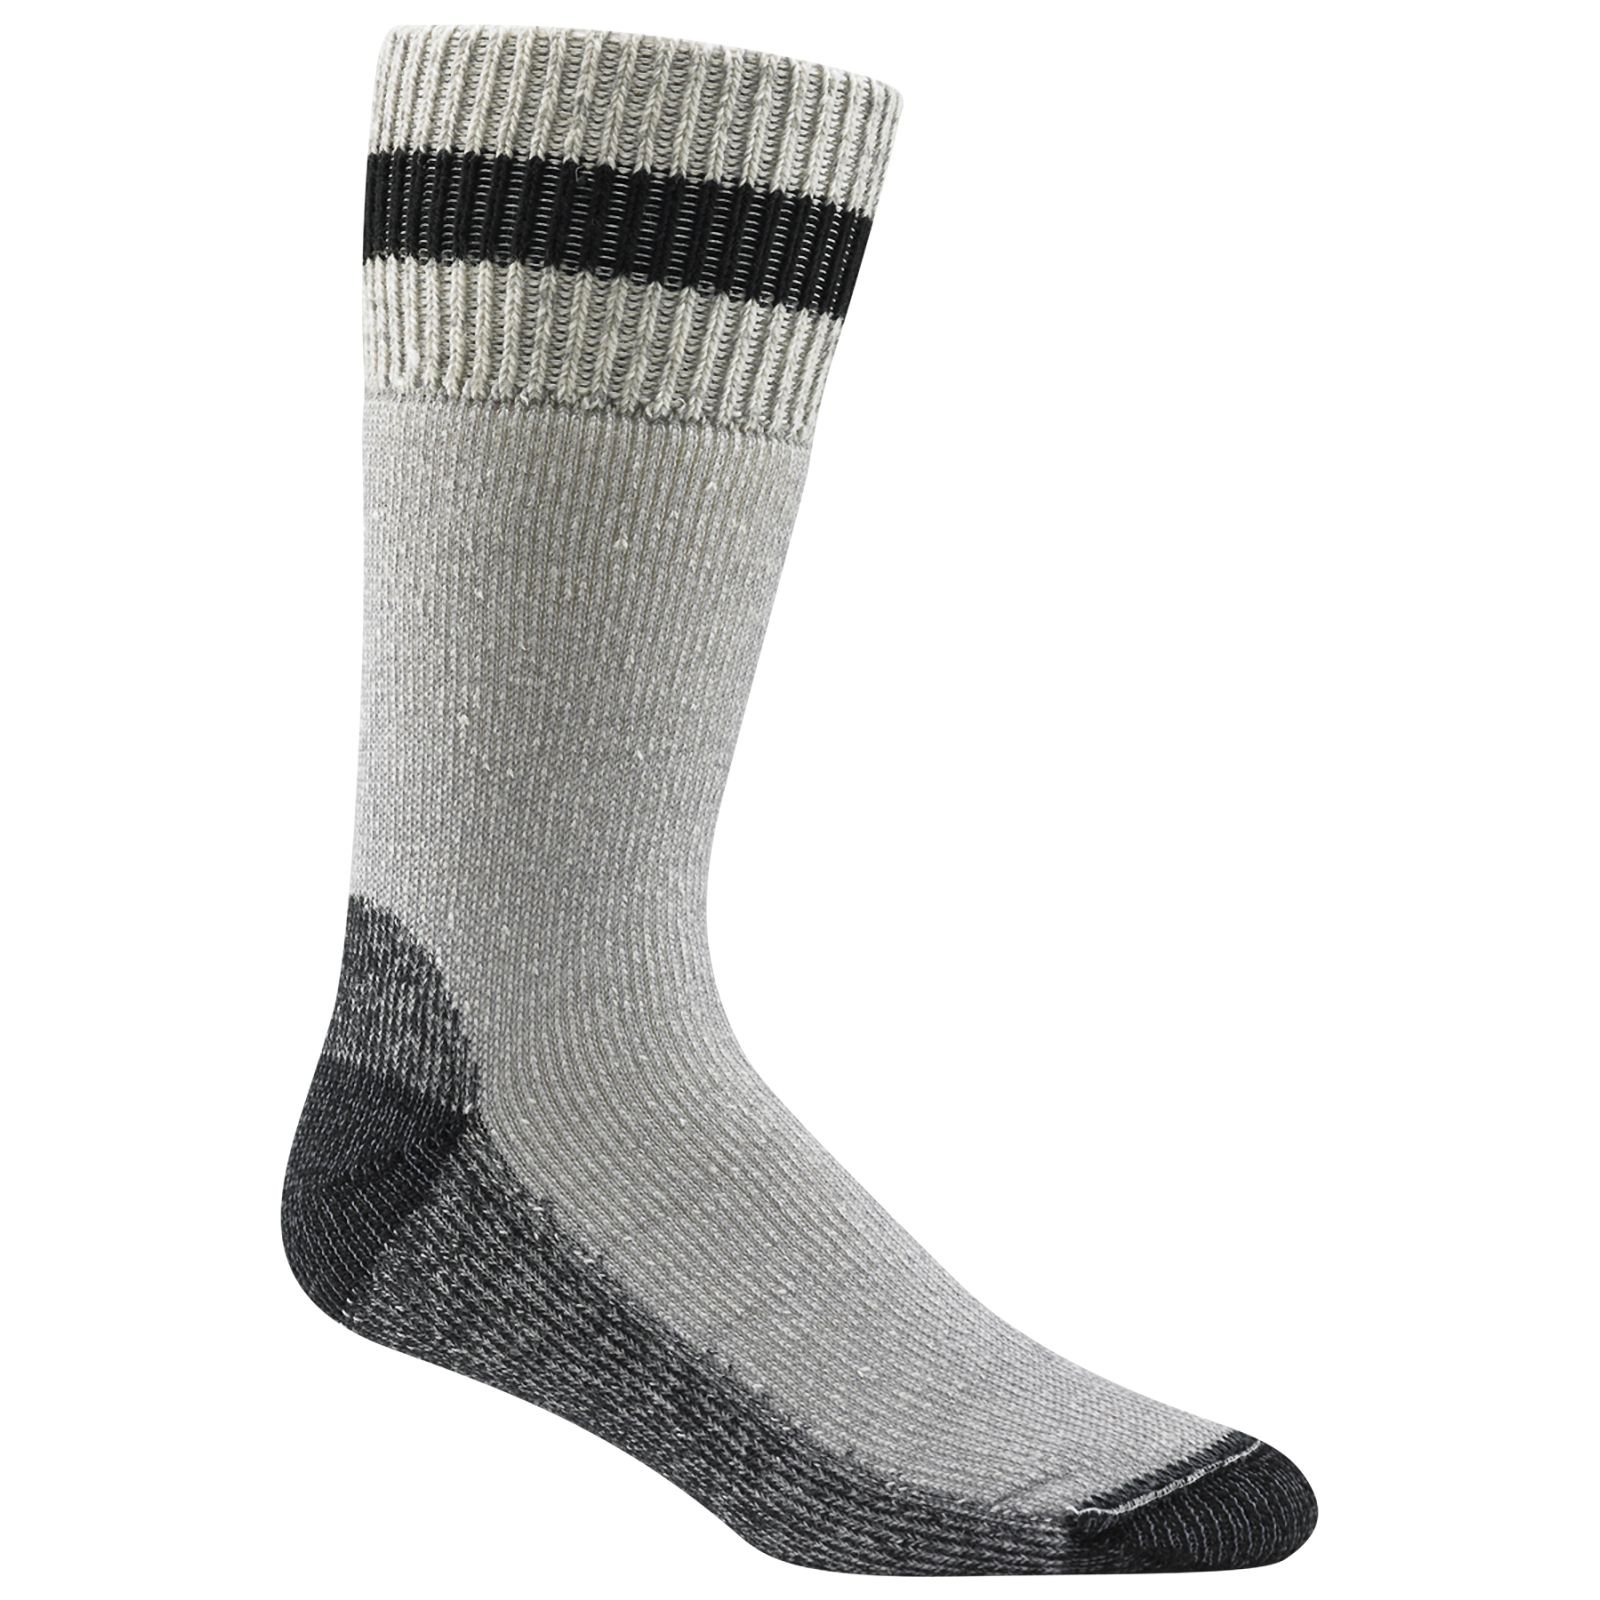 Wigwam Diabetic Thermal Socks,Gray/Black,XL by Wigwam